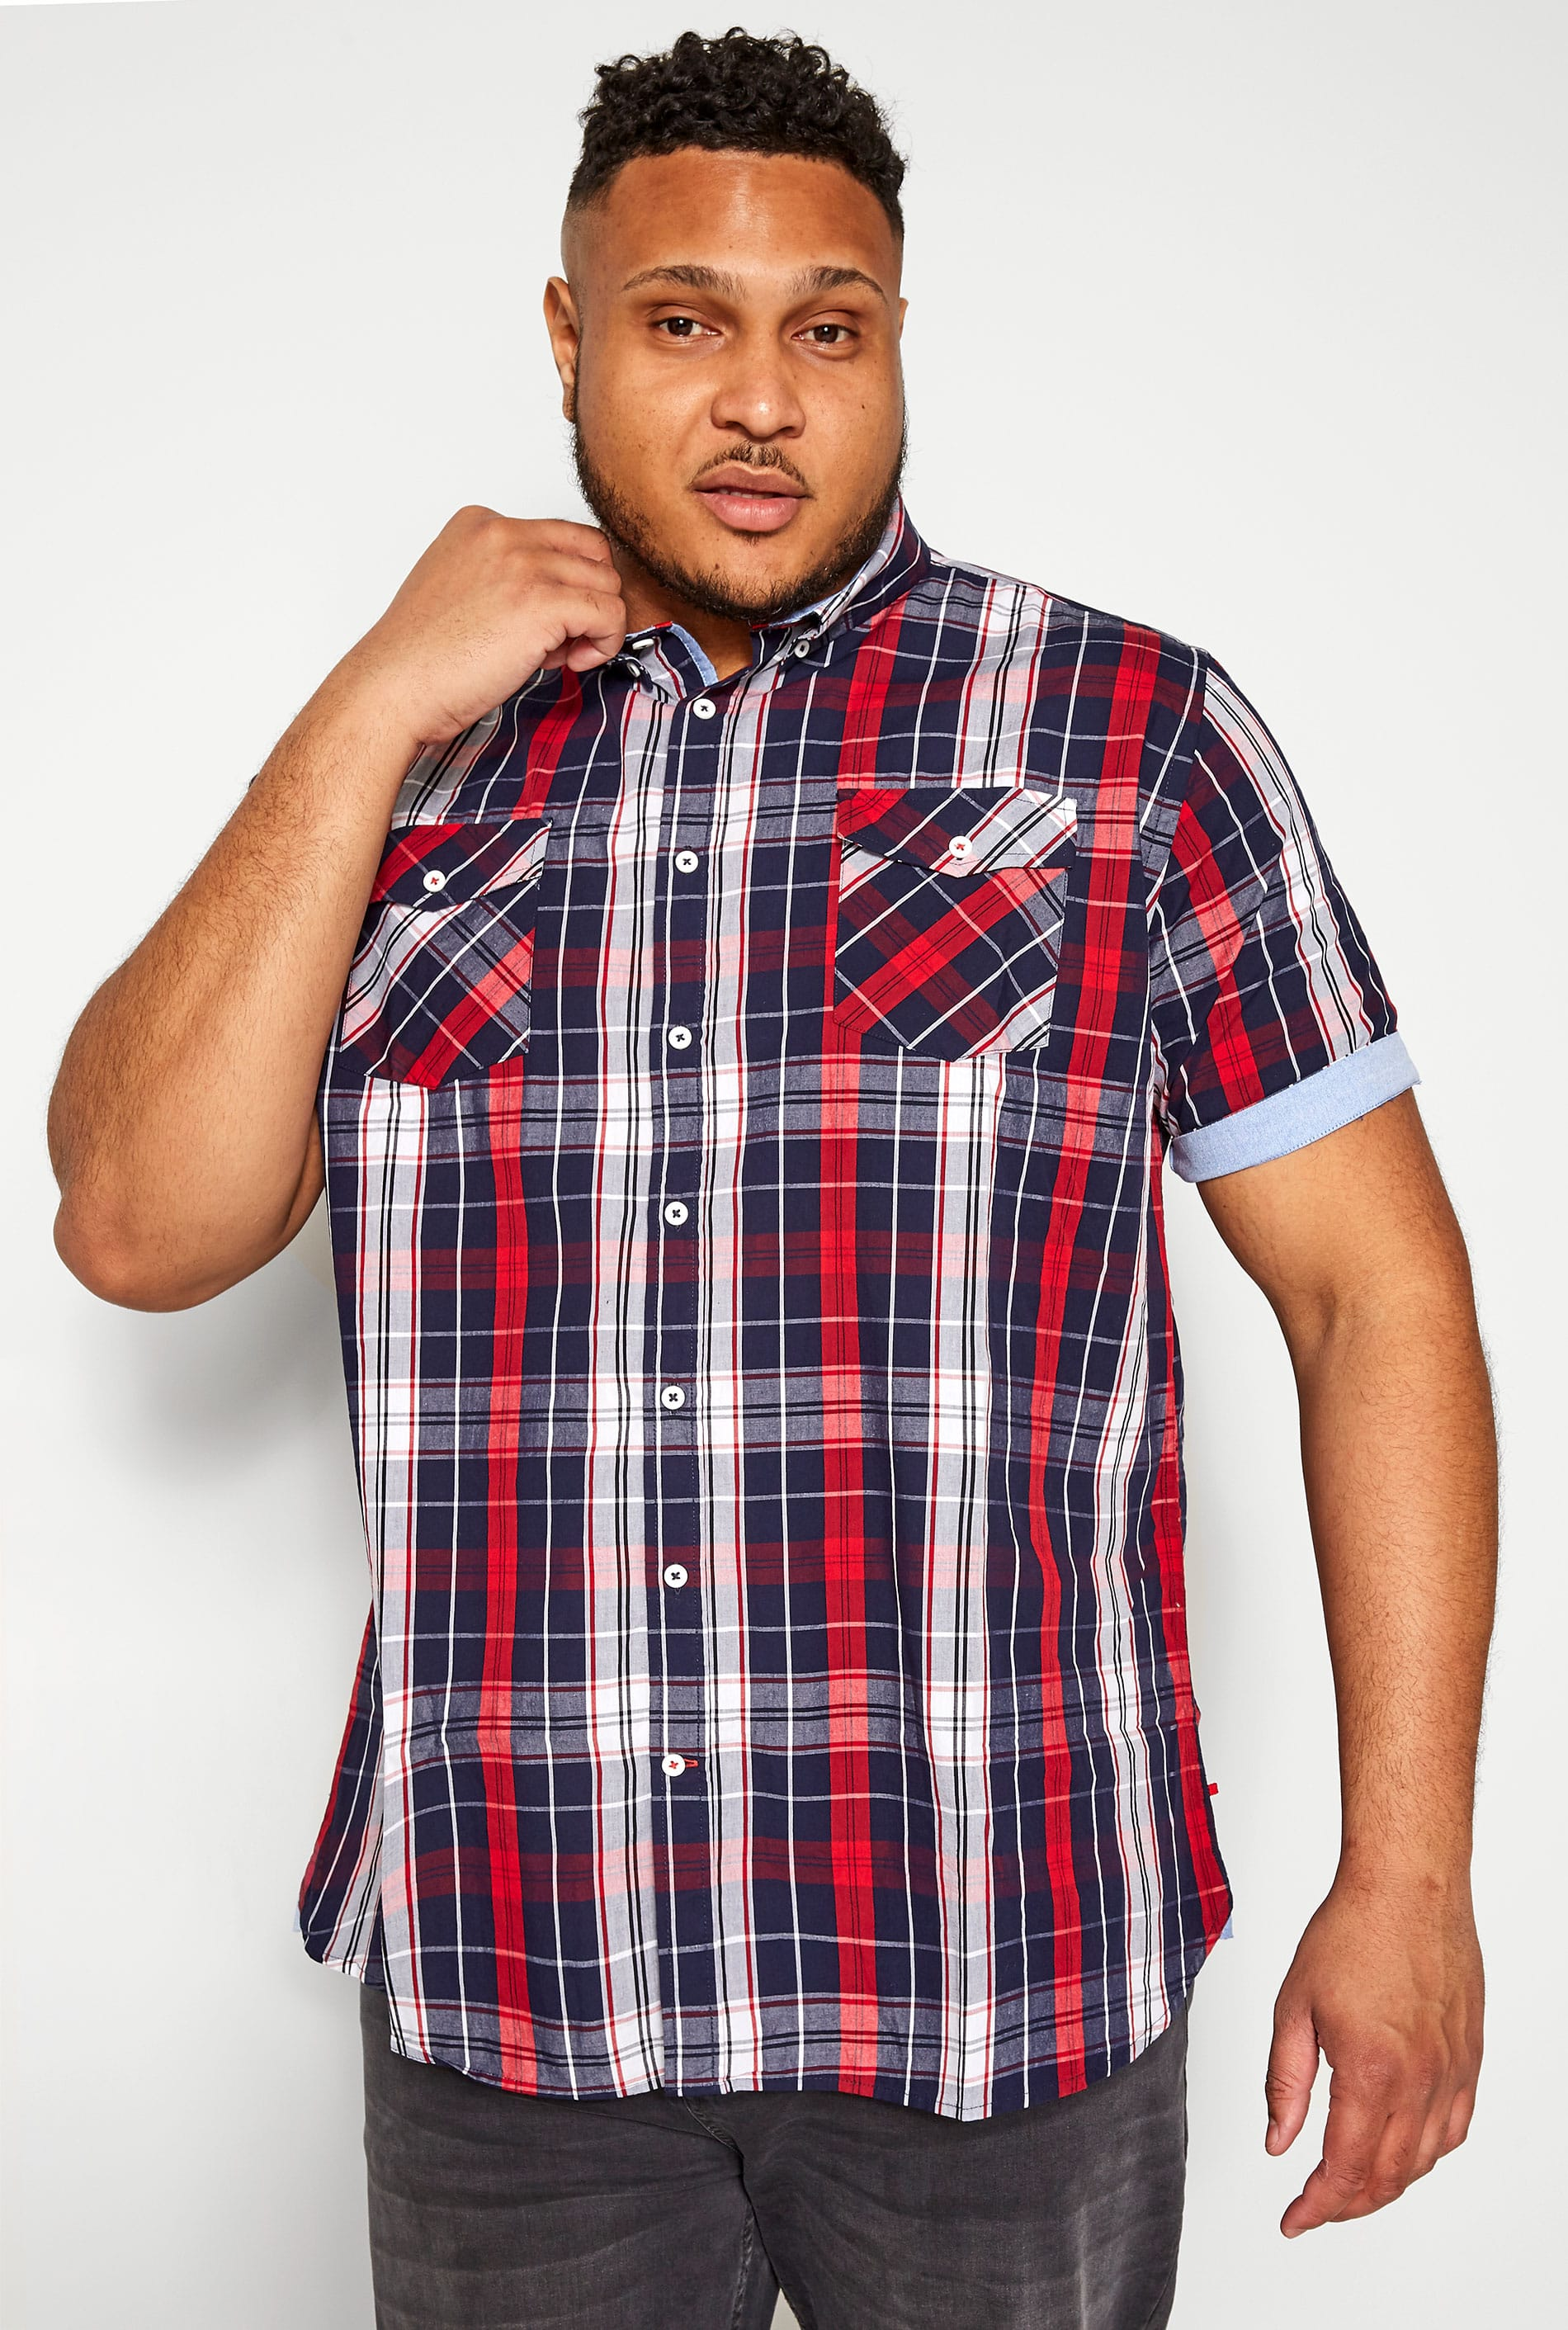 D555 Red & Navy Check Shirt